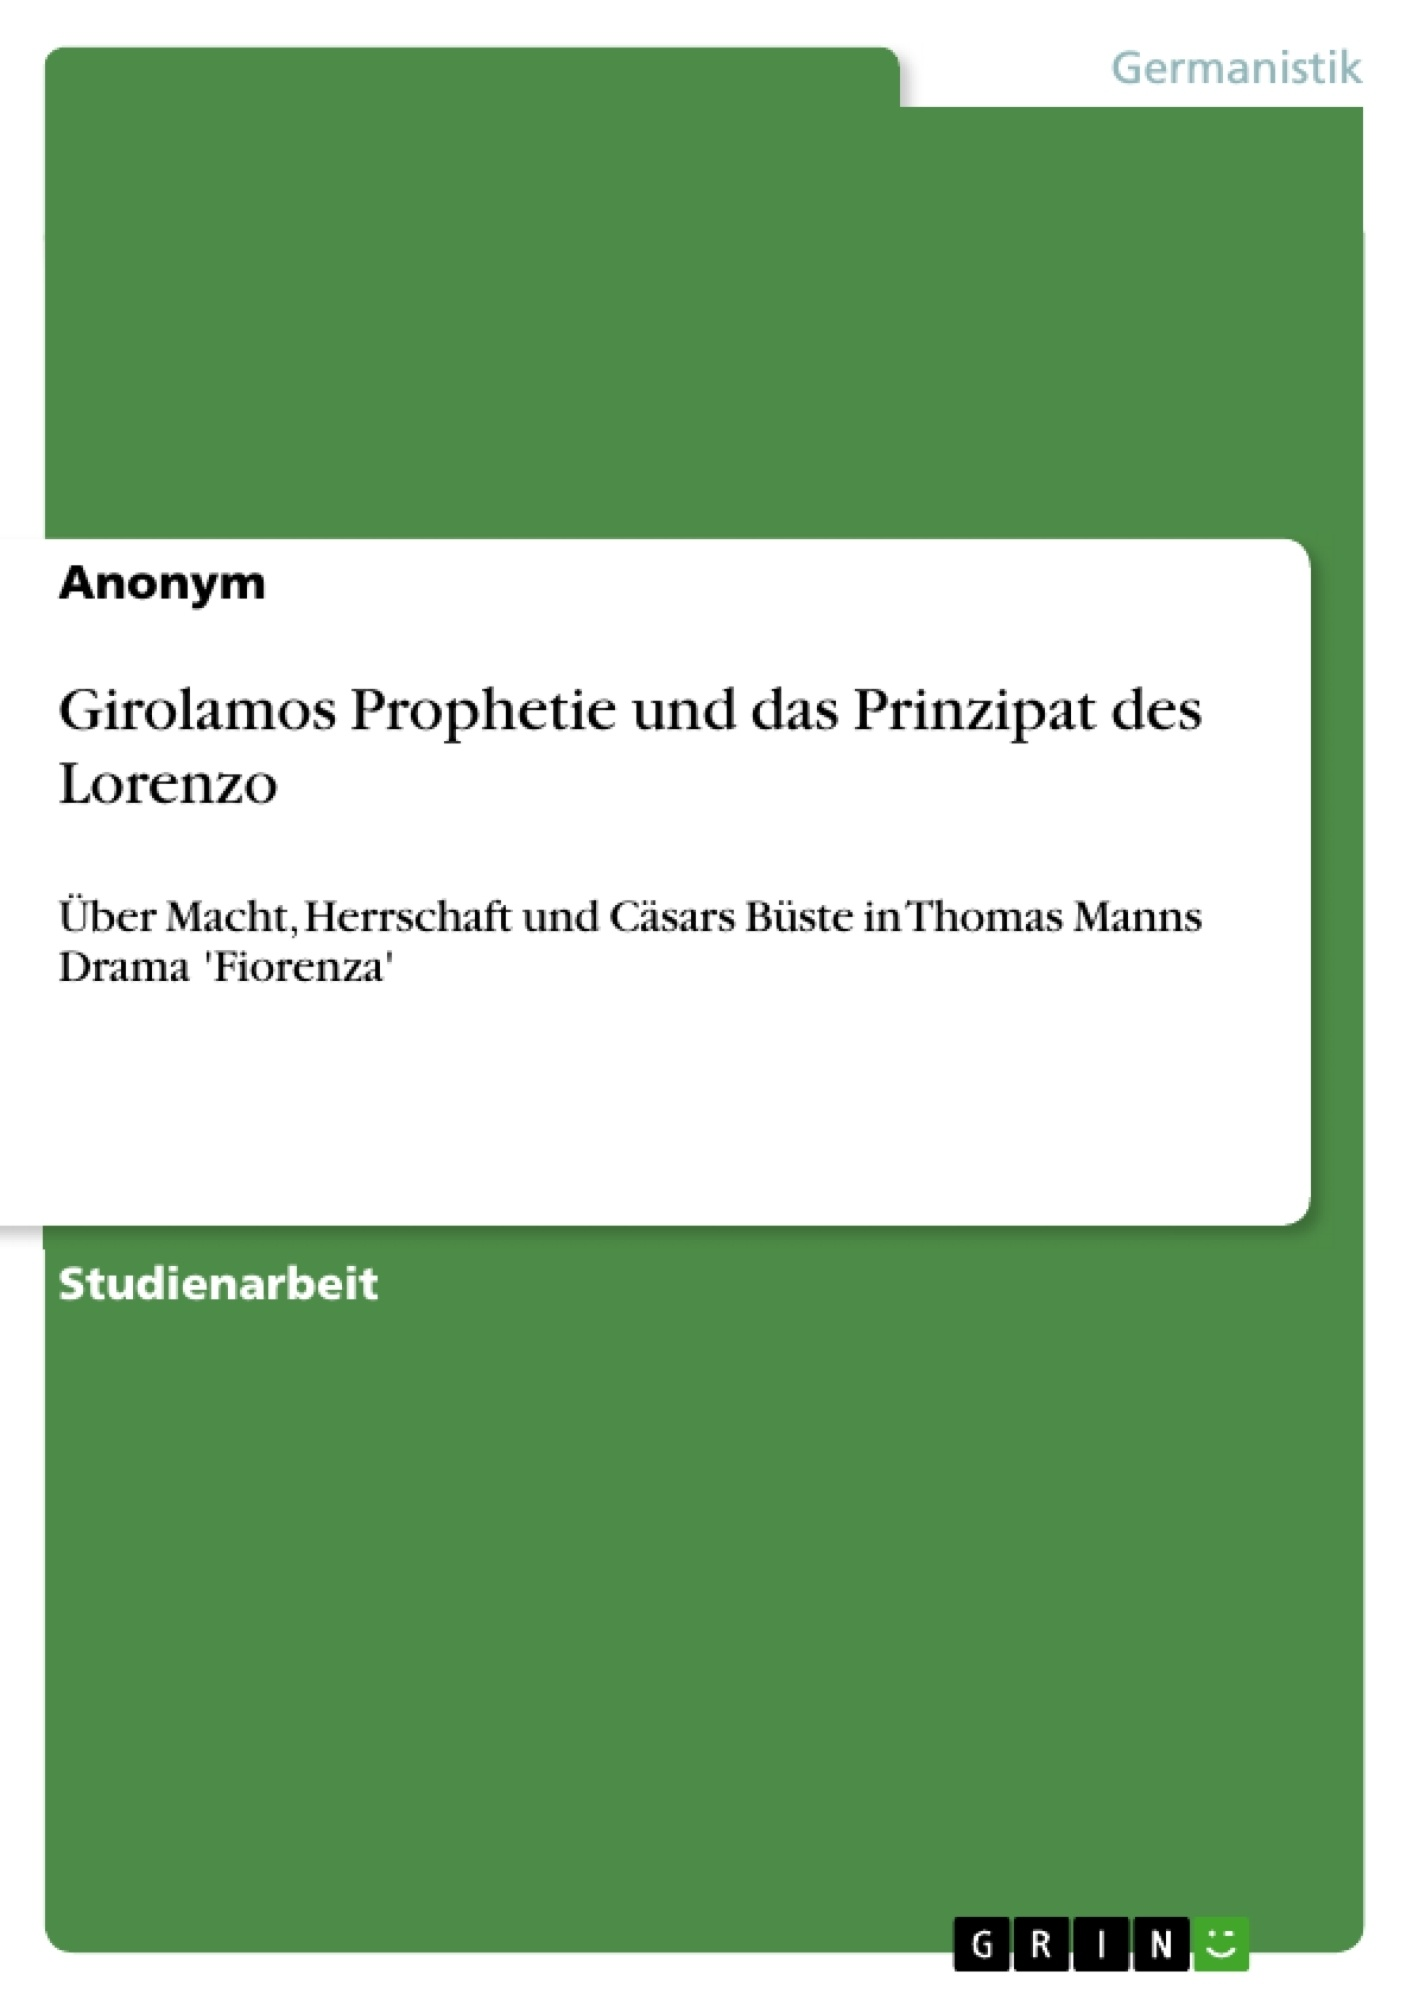 Titel: Girolamos Prophetie und das Prinzipat des Lorenzo